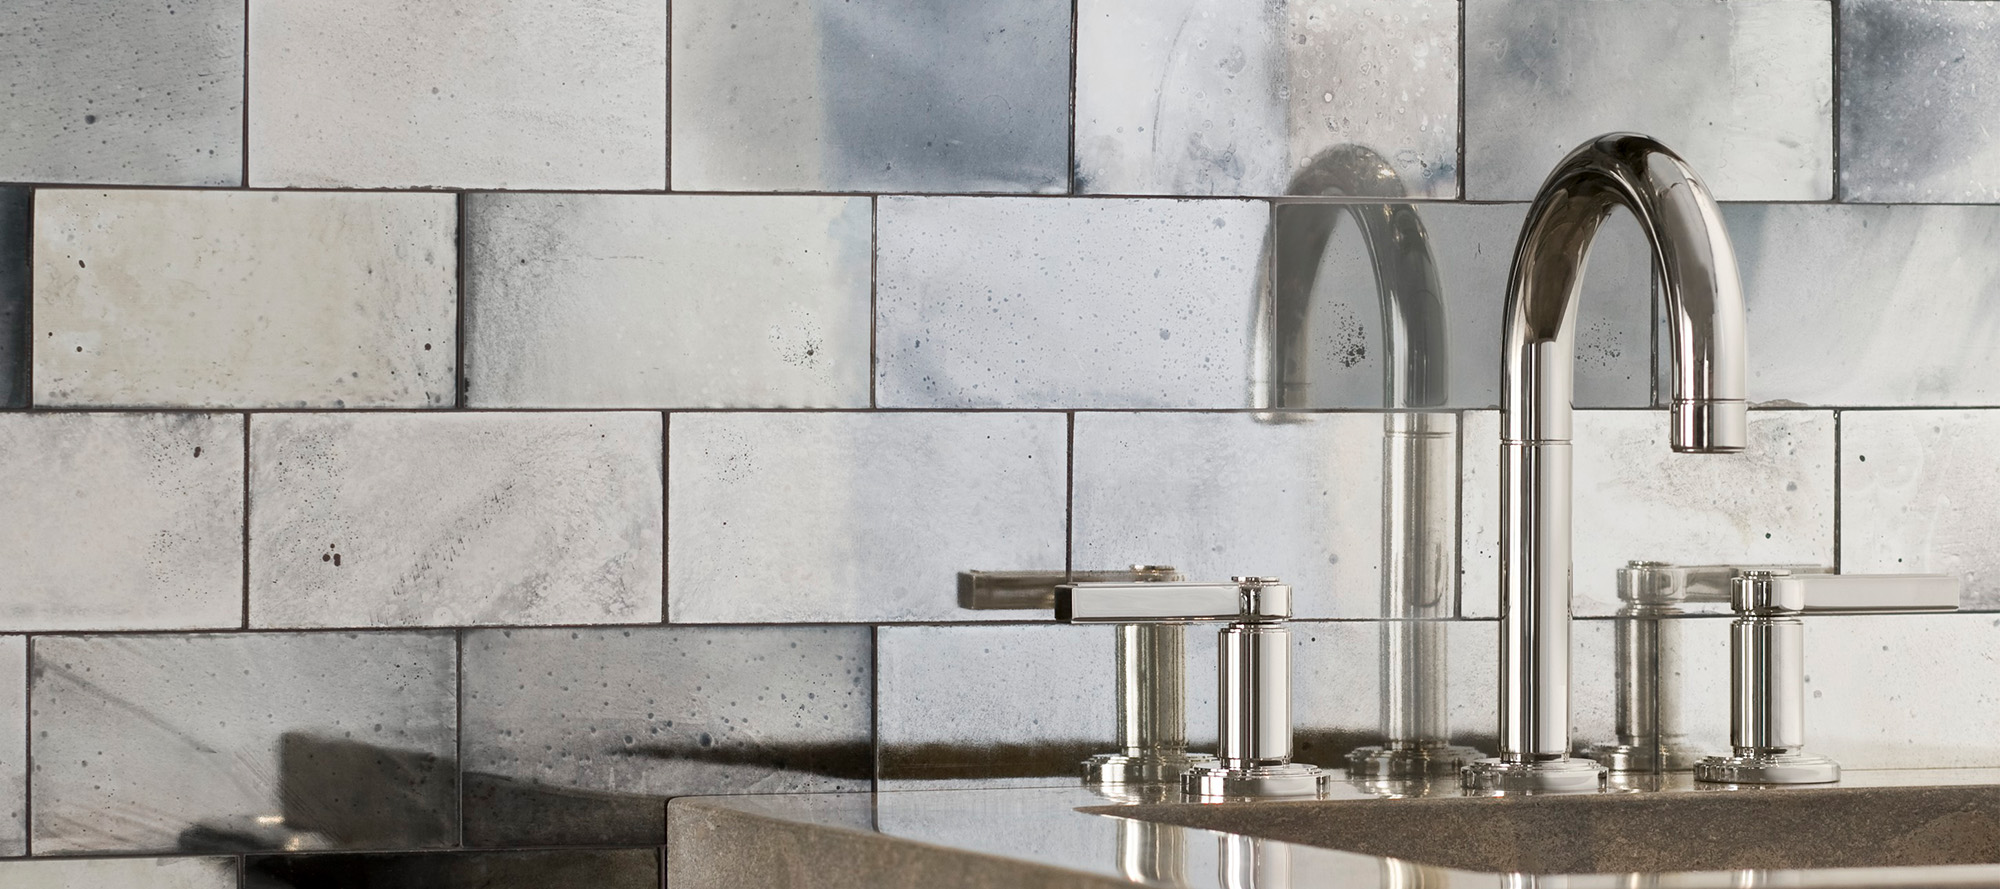 Vir Stil Minimal By Laura Kirar Pull Down Kitchen Faucet P23071 00 Kitchen Faucets Kallista Kallista